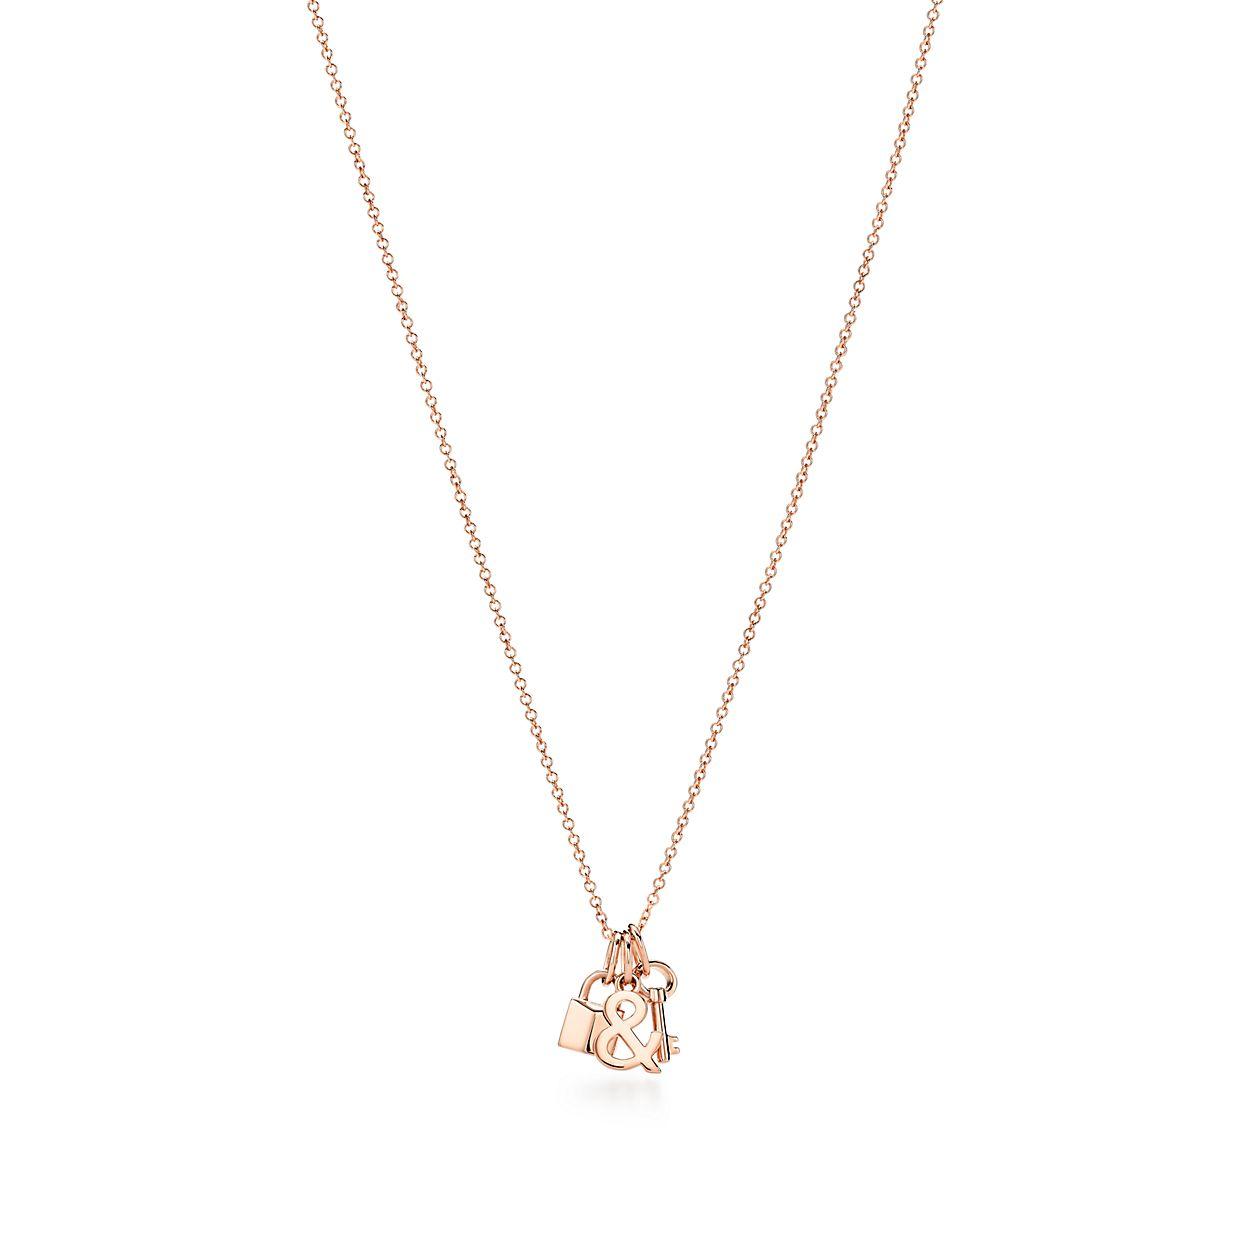 Tiffany Love Lock And Key Pendant In 18k Rose Gold Tiffany Co